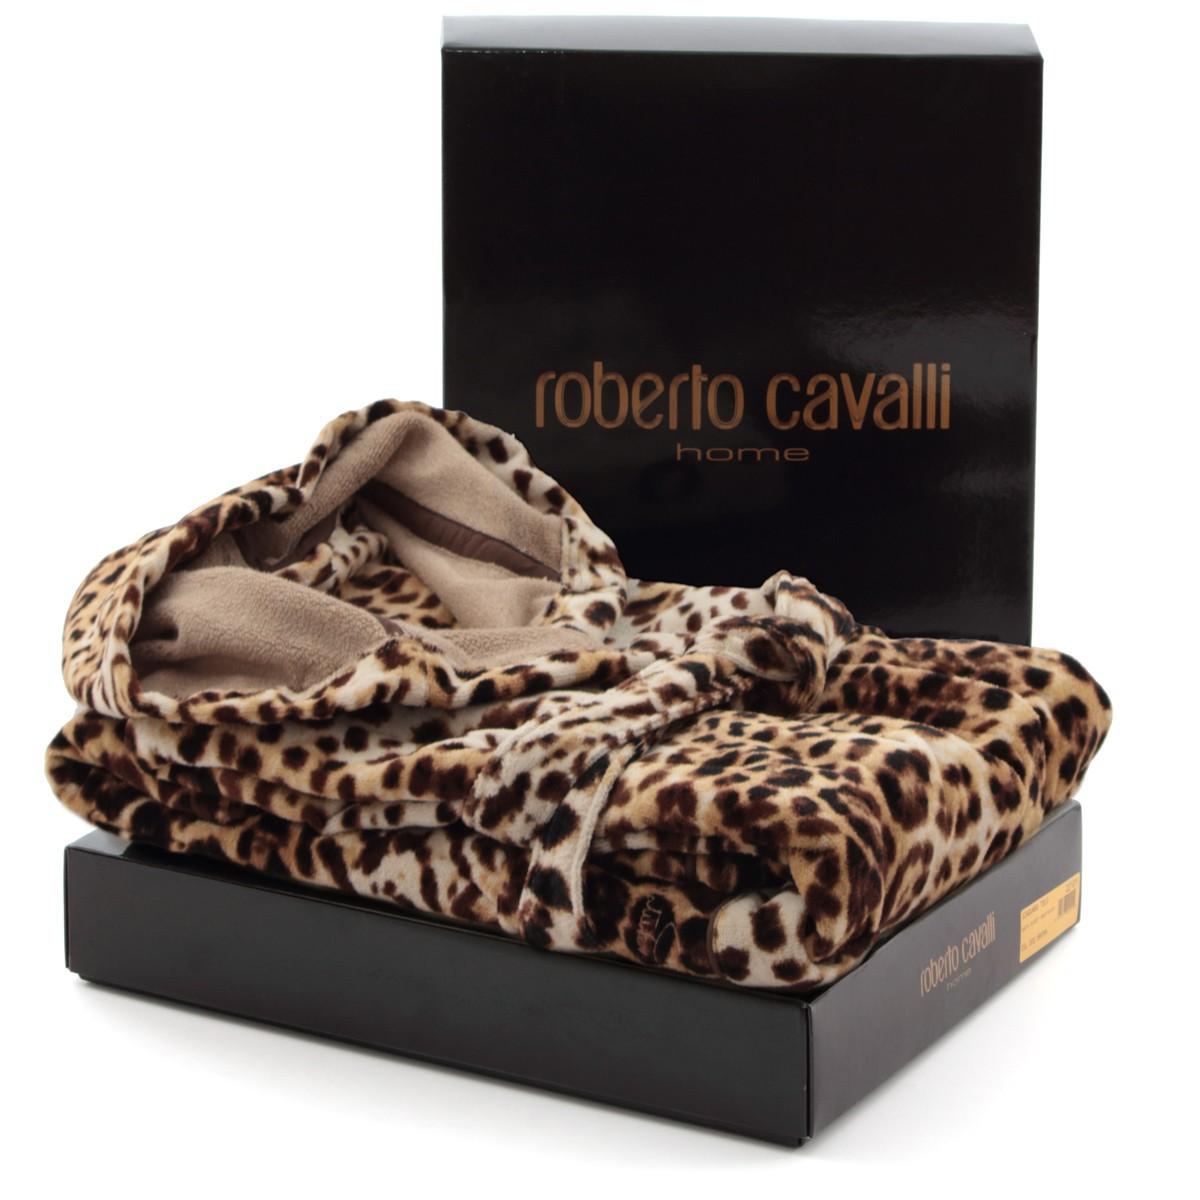 Халаты Халат велюровый Roberto Cavalli Bravo с капюшоном коричневый velyurovyy-halat-bravo-ot-roberto-cavalli.jpg